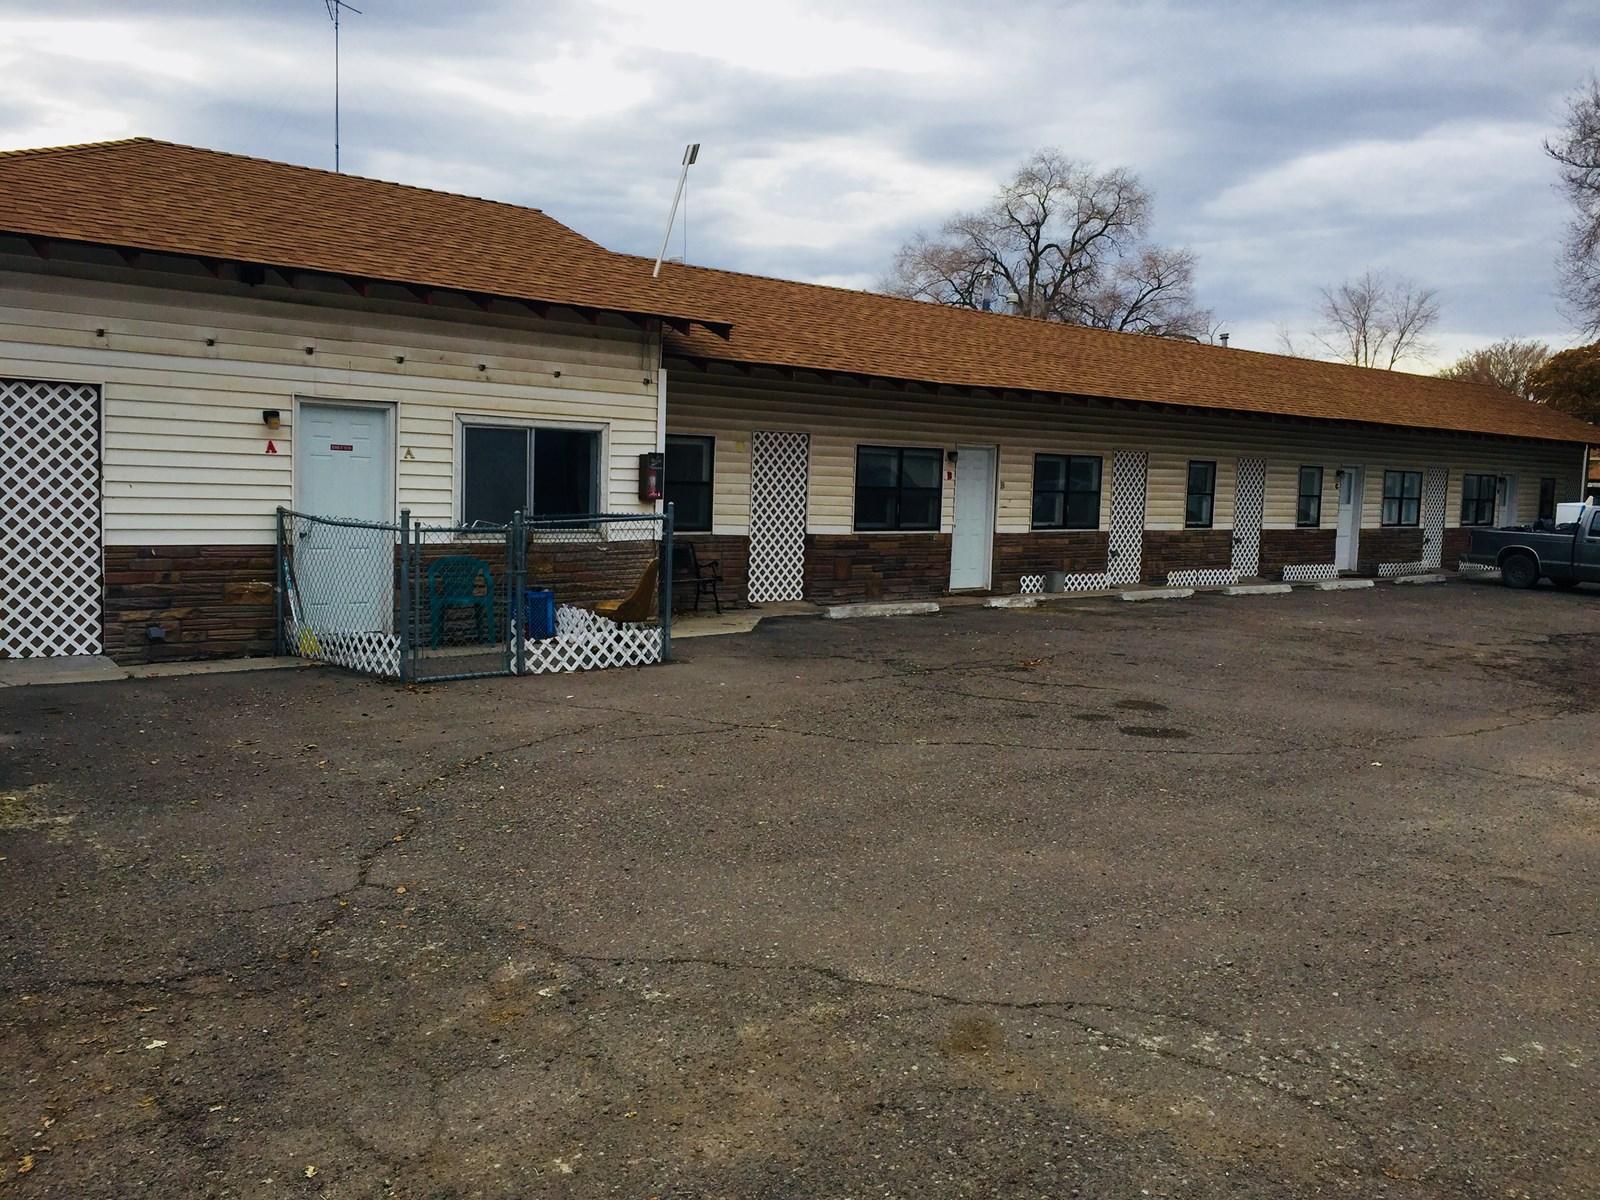 Investment property Lovelock NV formerly Sage Motel